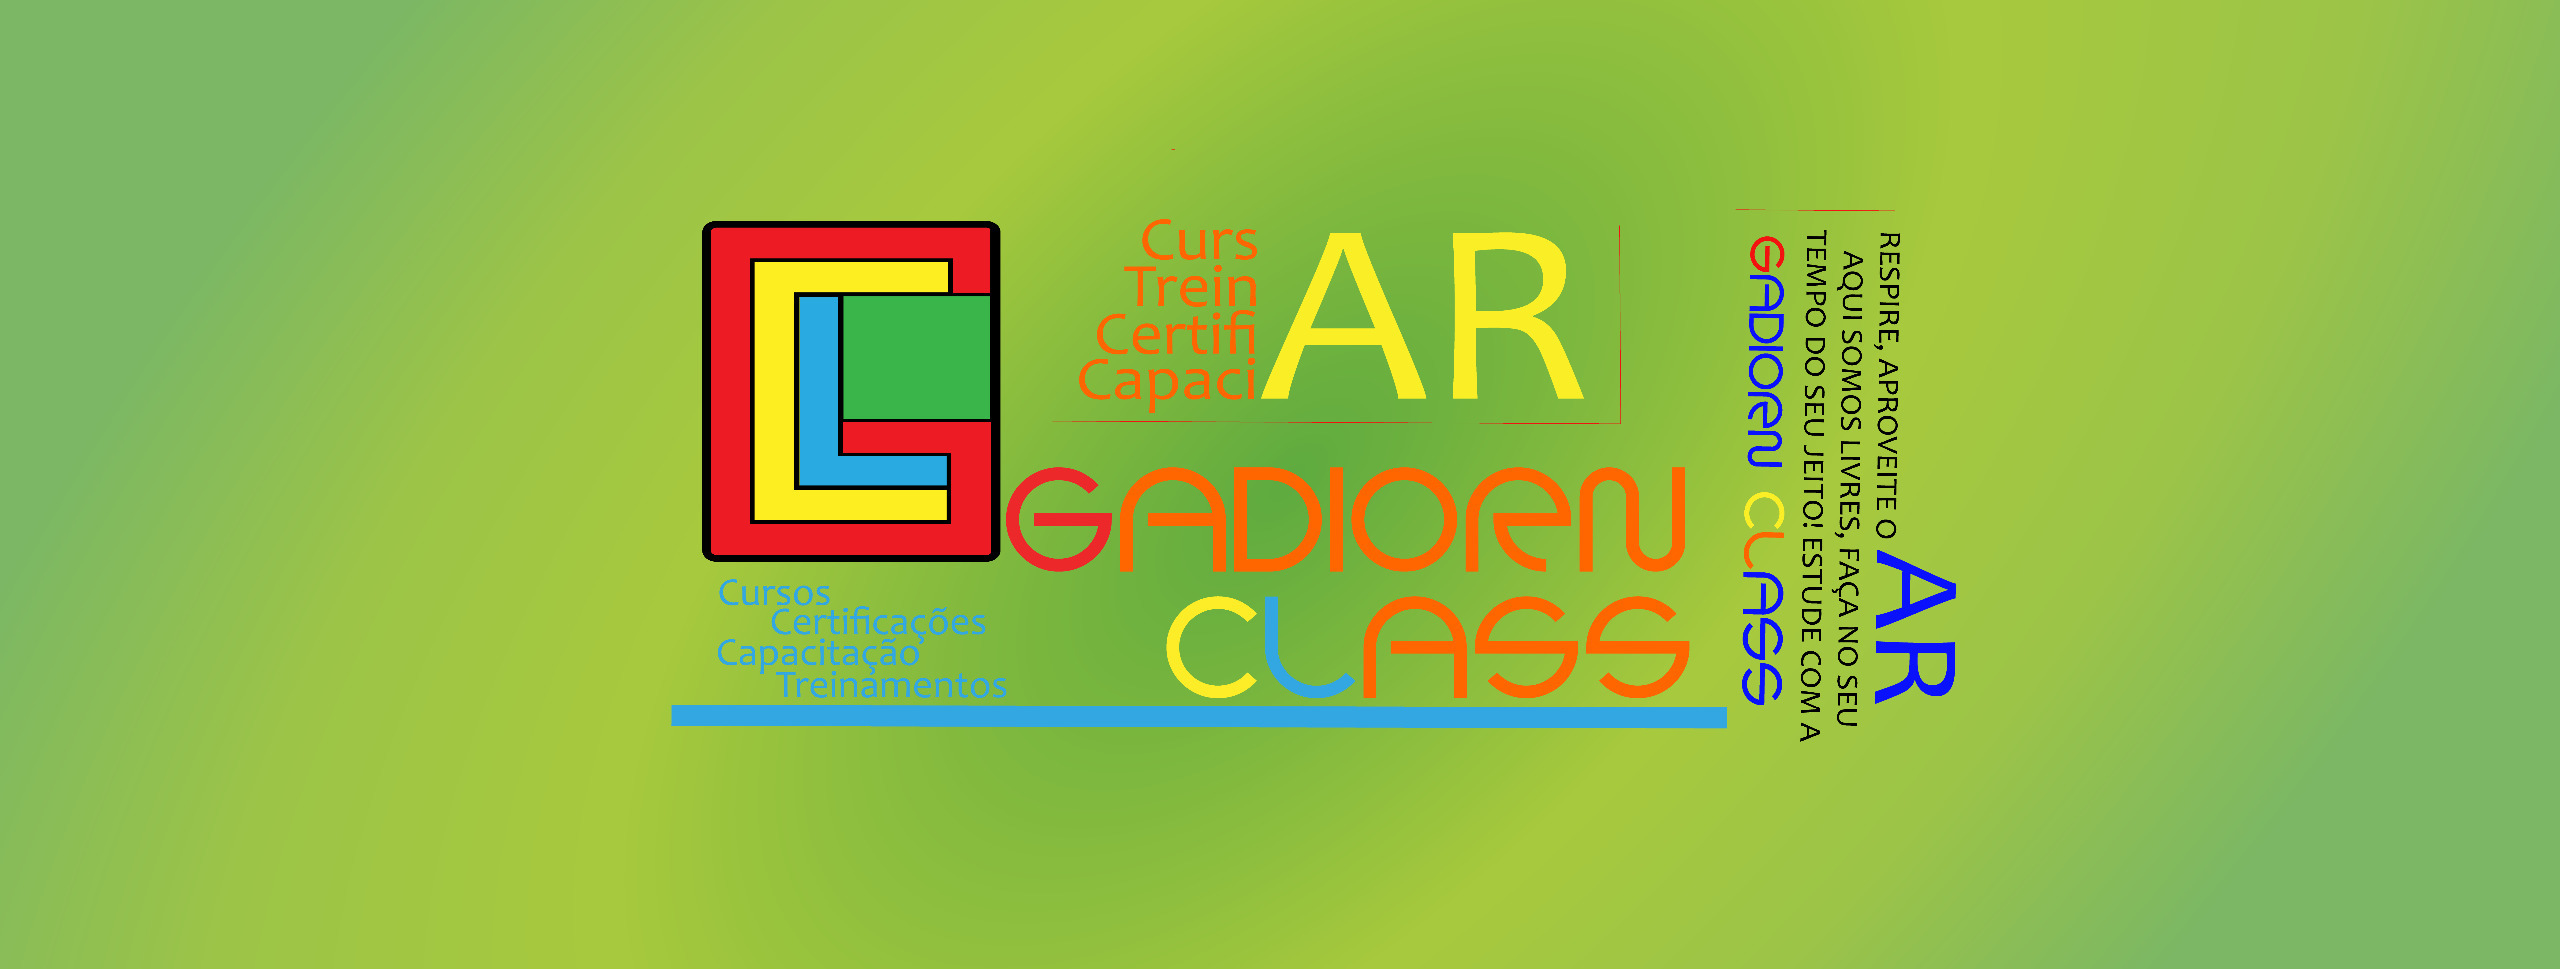 GADIORN CLASS CURS (@gadiornclass) Cover Image